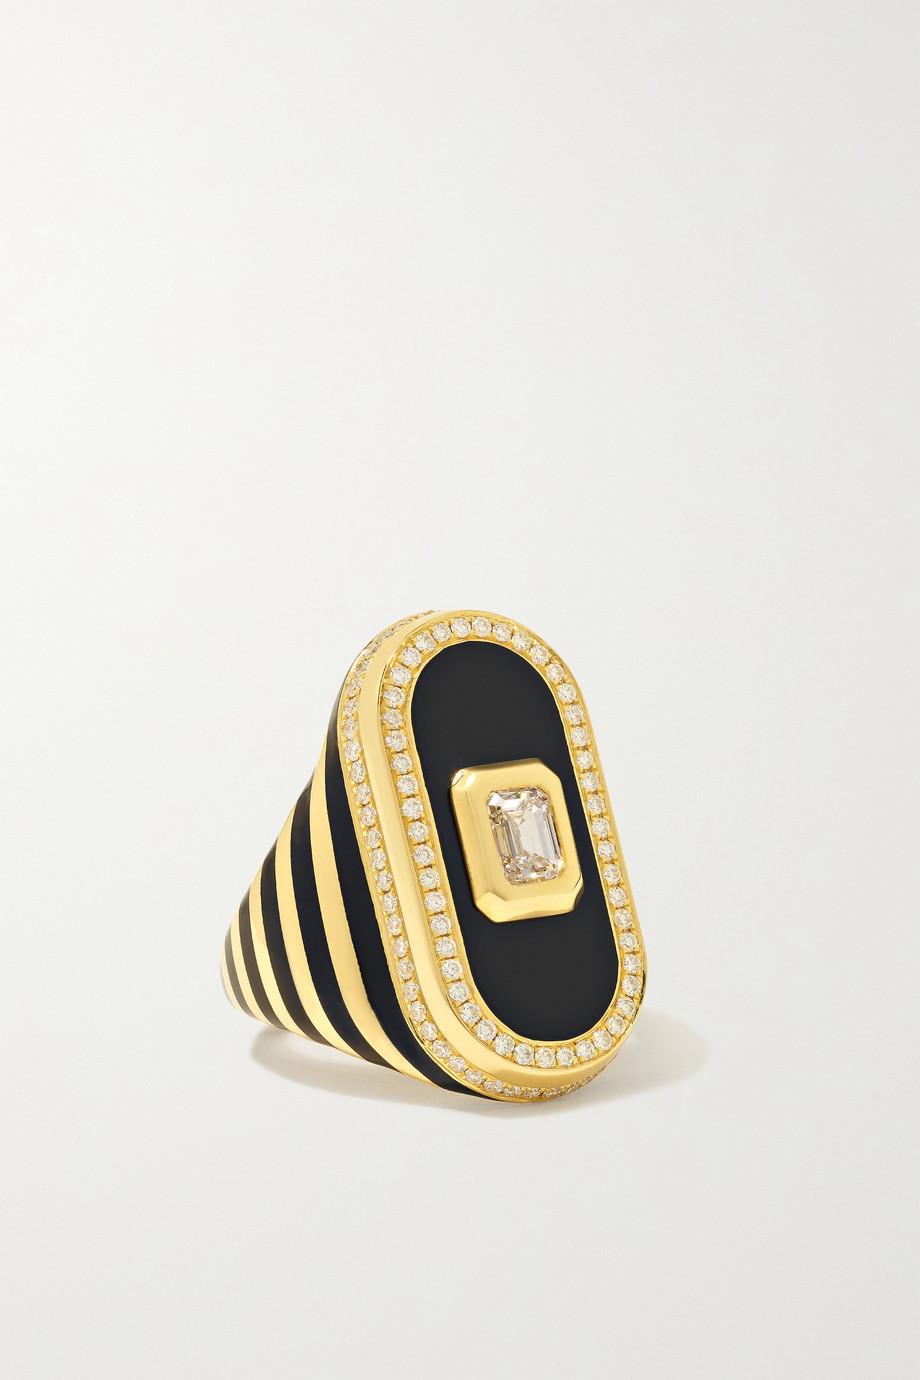 State Property Battuta 18-karat gold, diamond and enamel ring